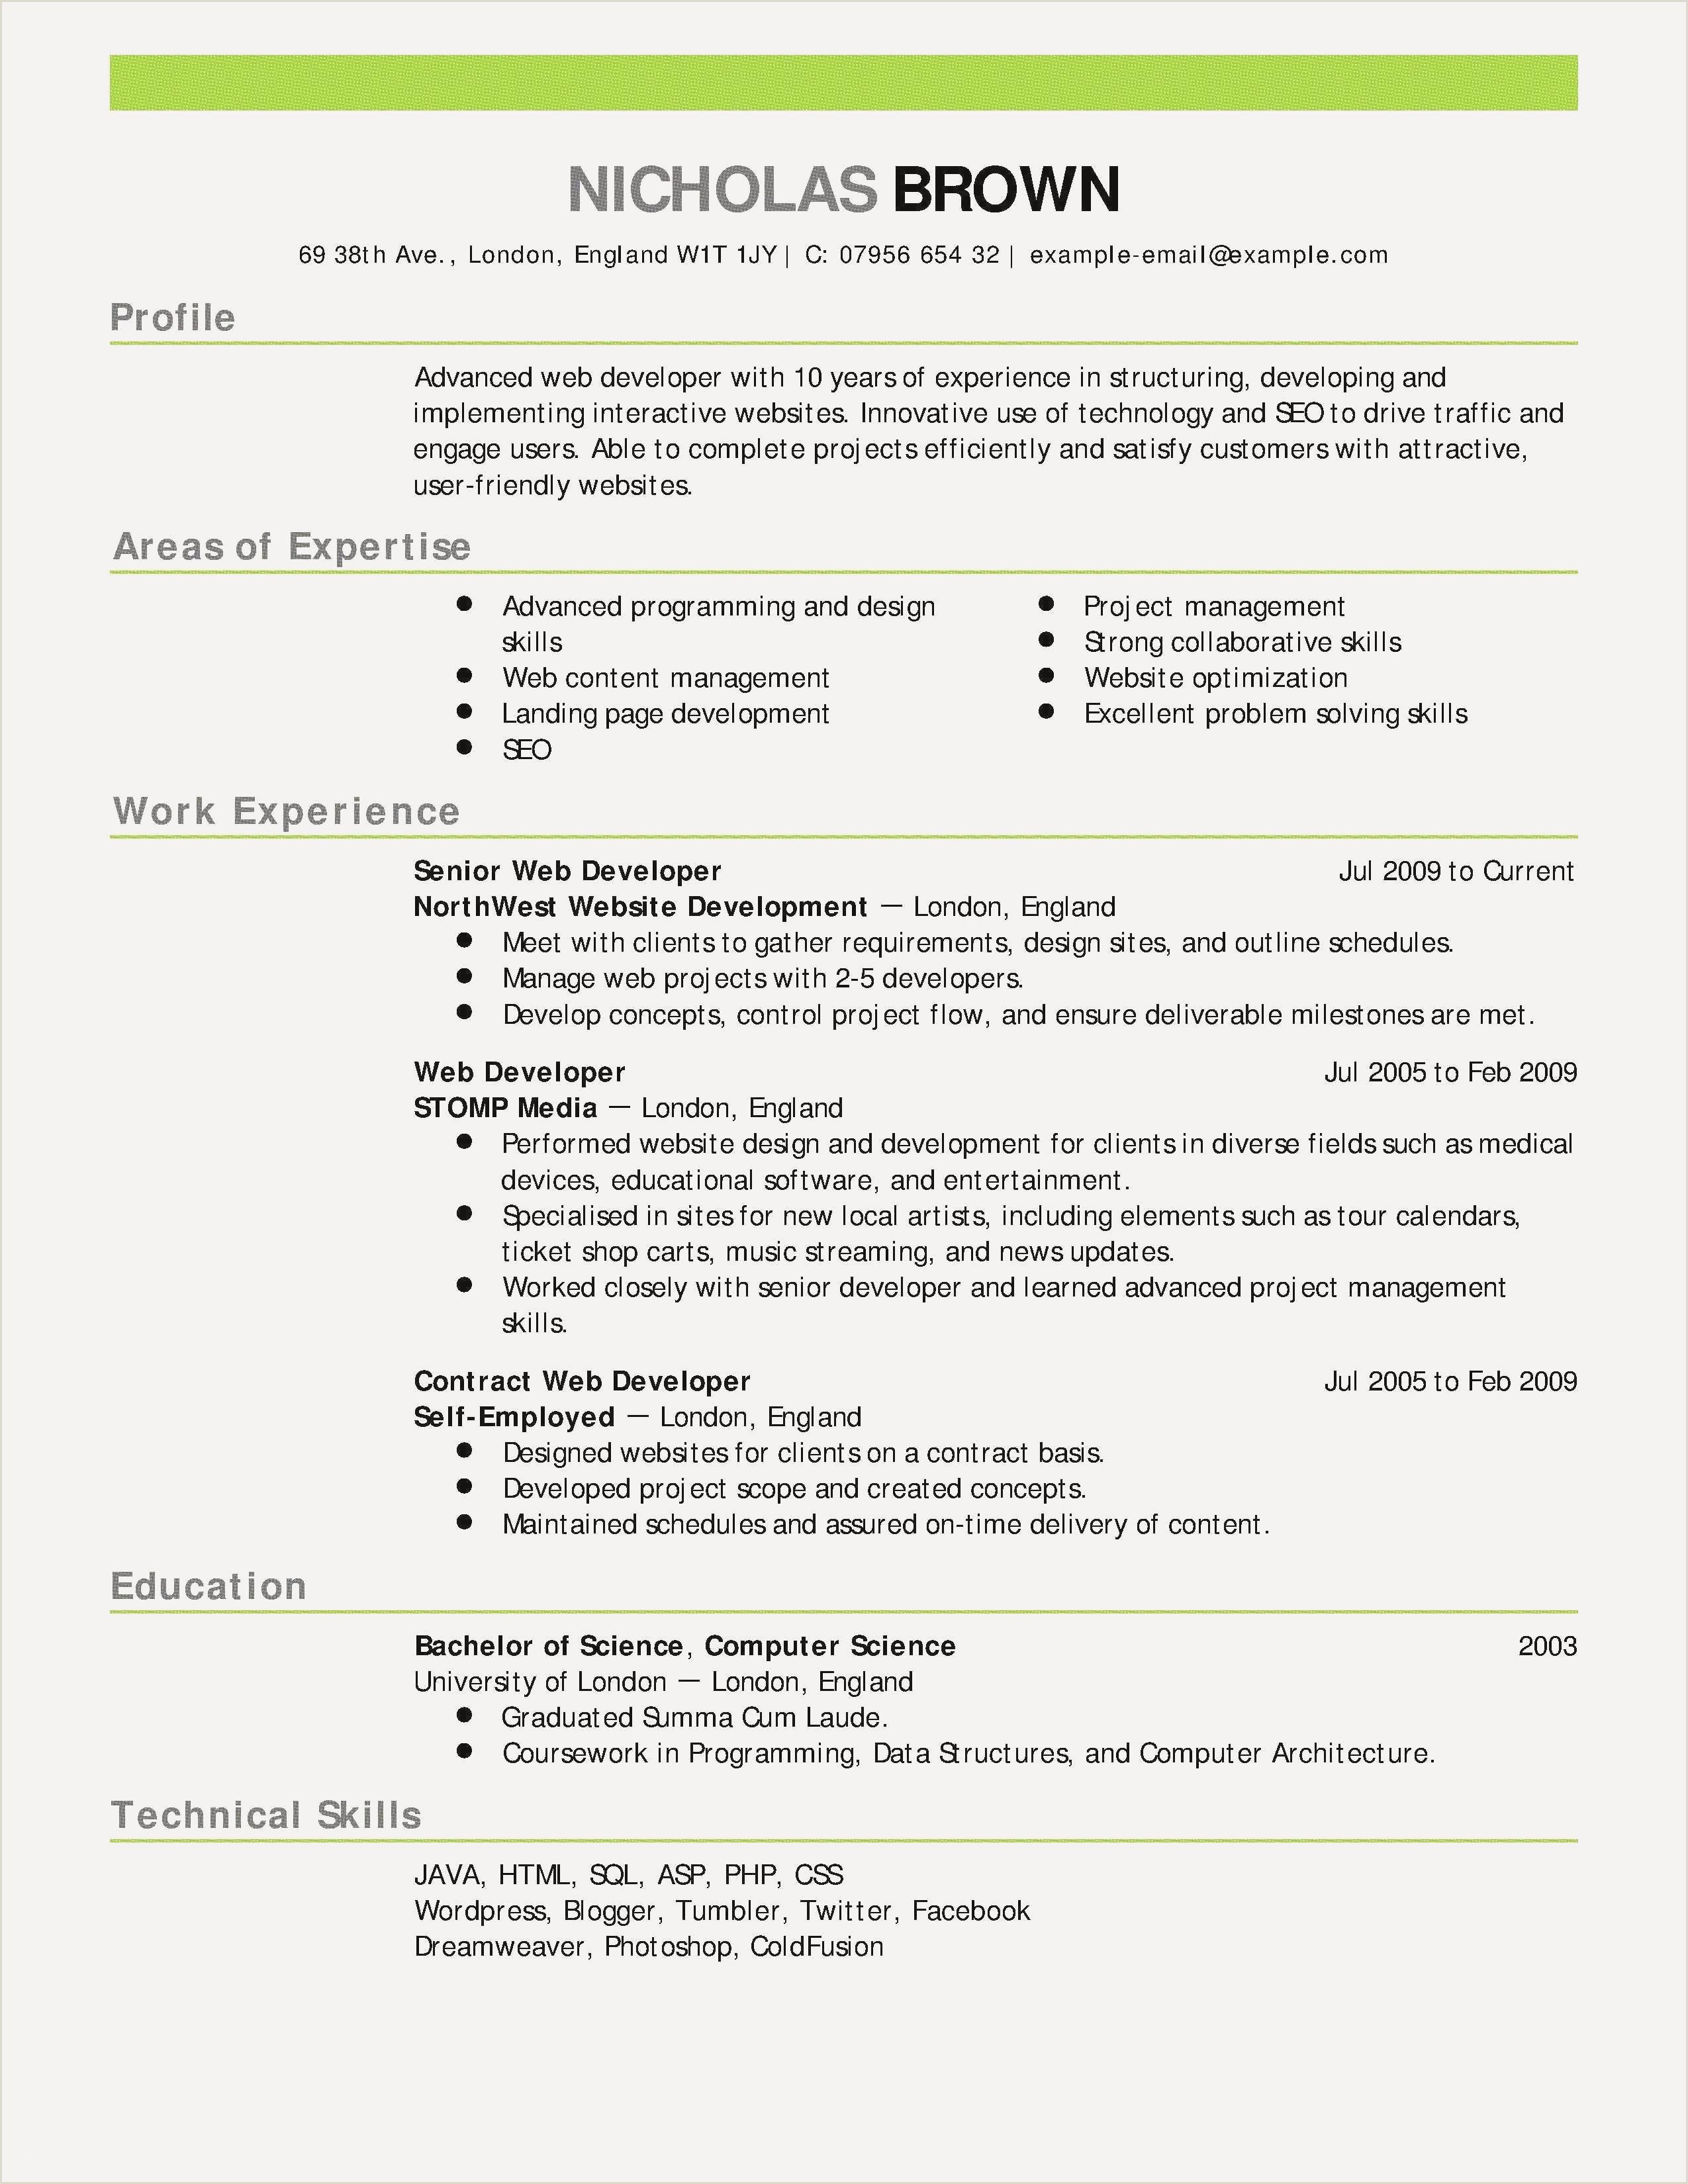 Cv format for Salesman Job Hairstyles Professional Resume Examples Enchanting Good